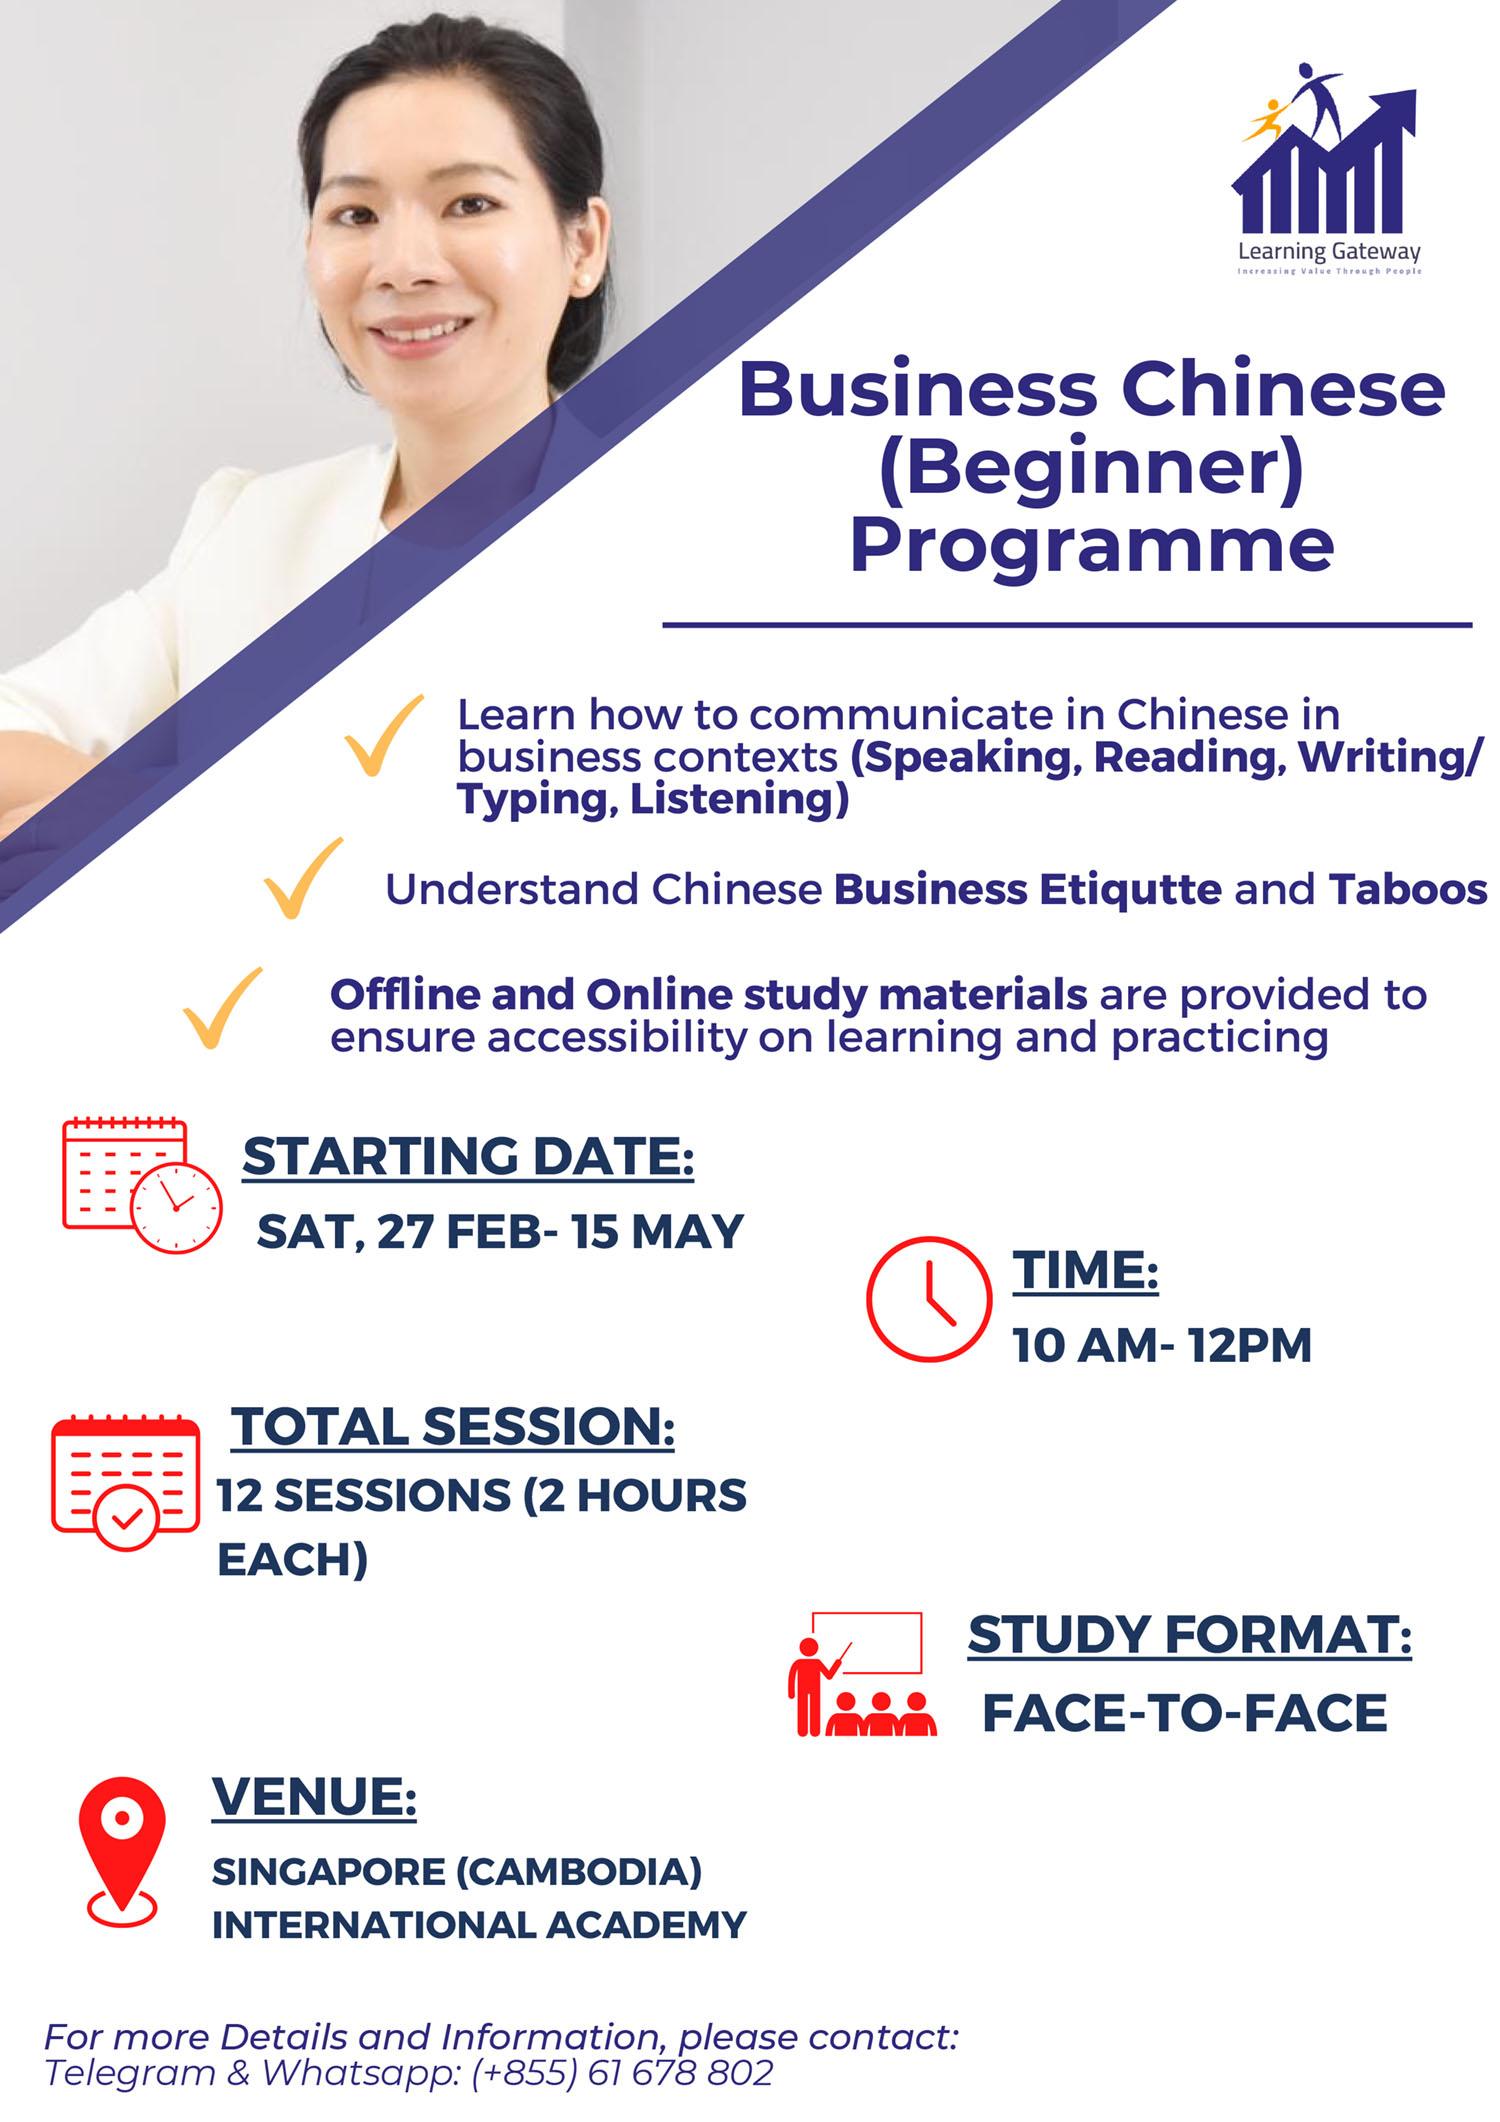 Business Chinese (Beginner) Programme